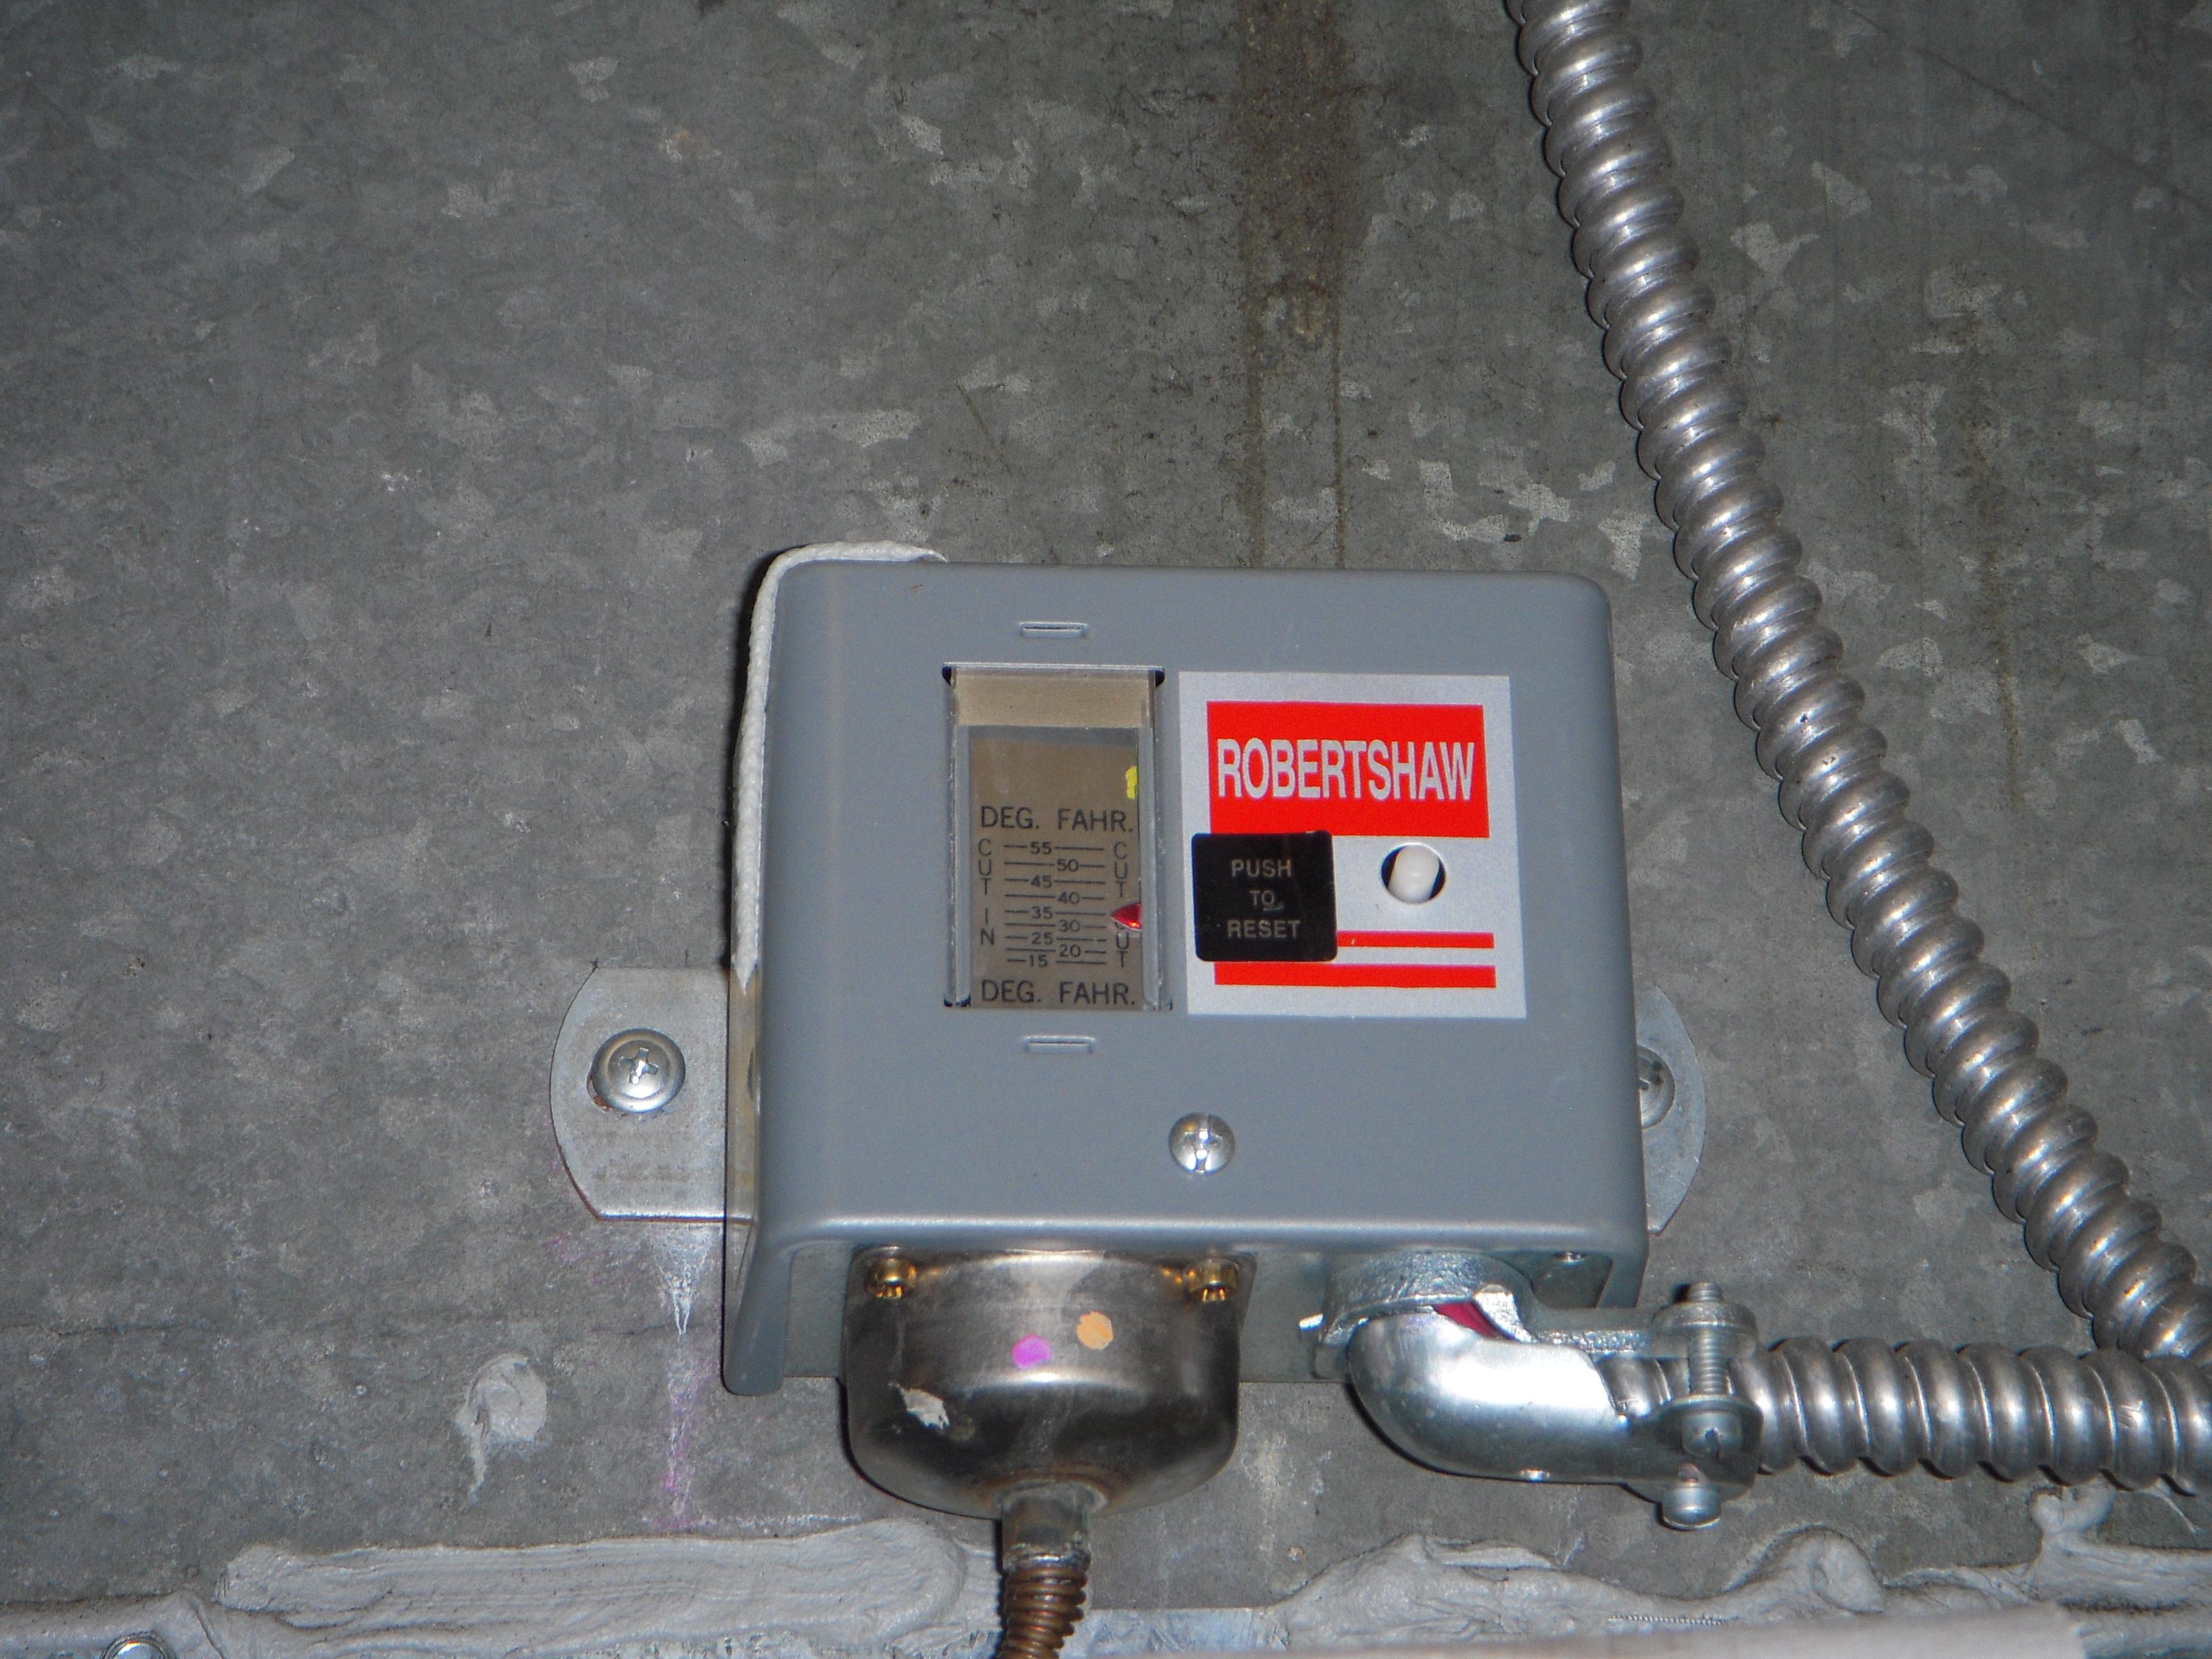 sf 2 freezestats 05 4 20 milliamp current loops; interpreting current loop information freeze stat wiring diagram at alyssarenee.co